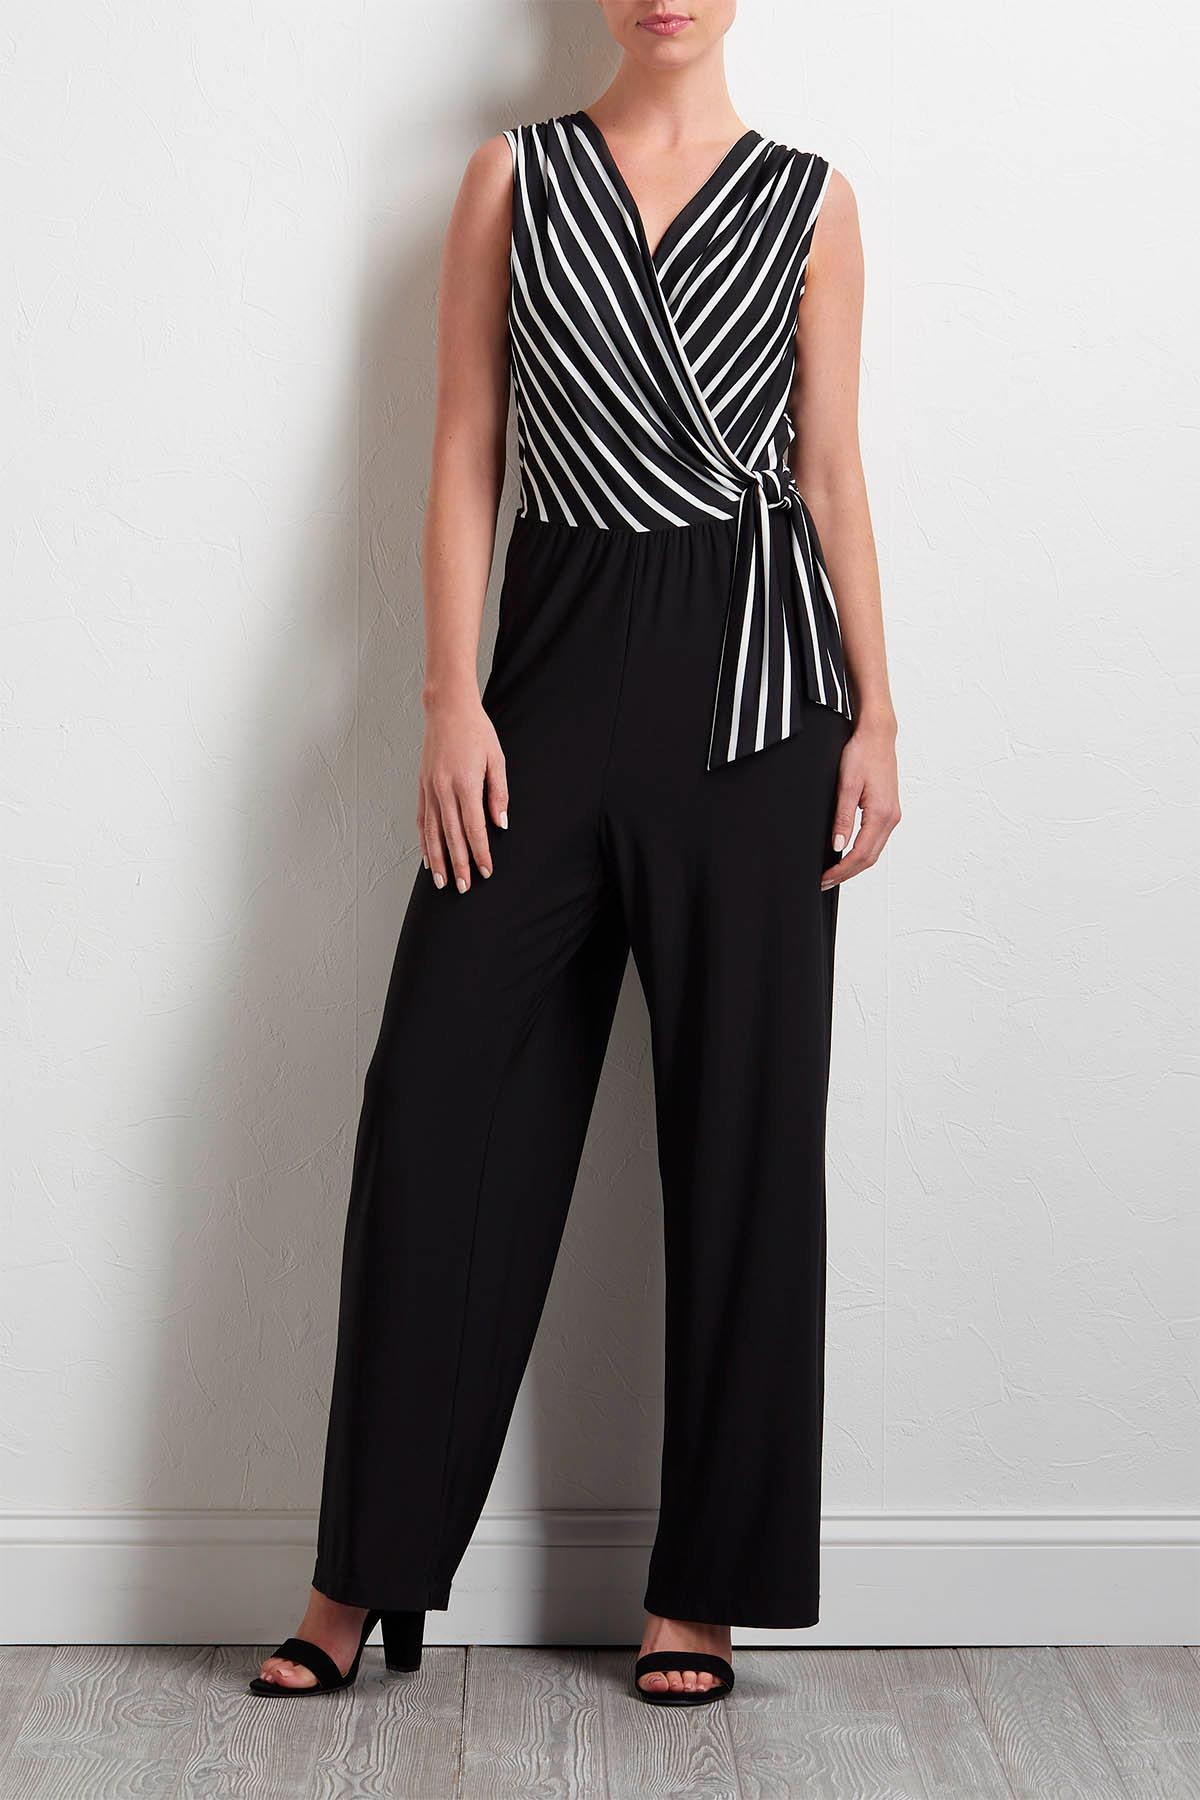 Black And White Surplice Jumpsuit